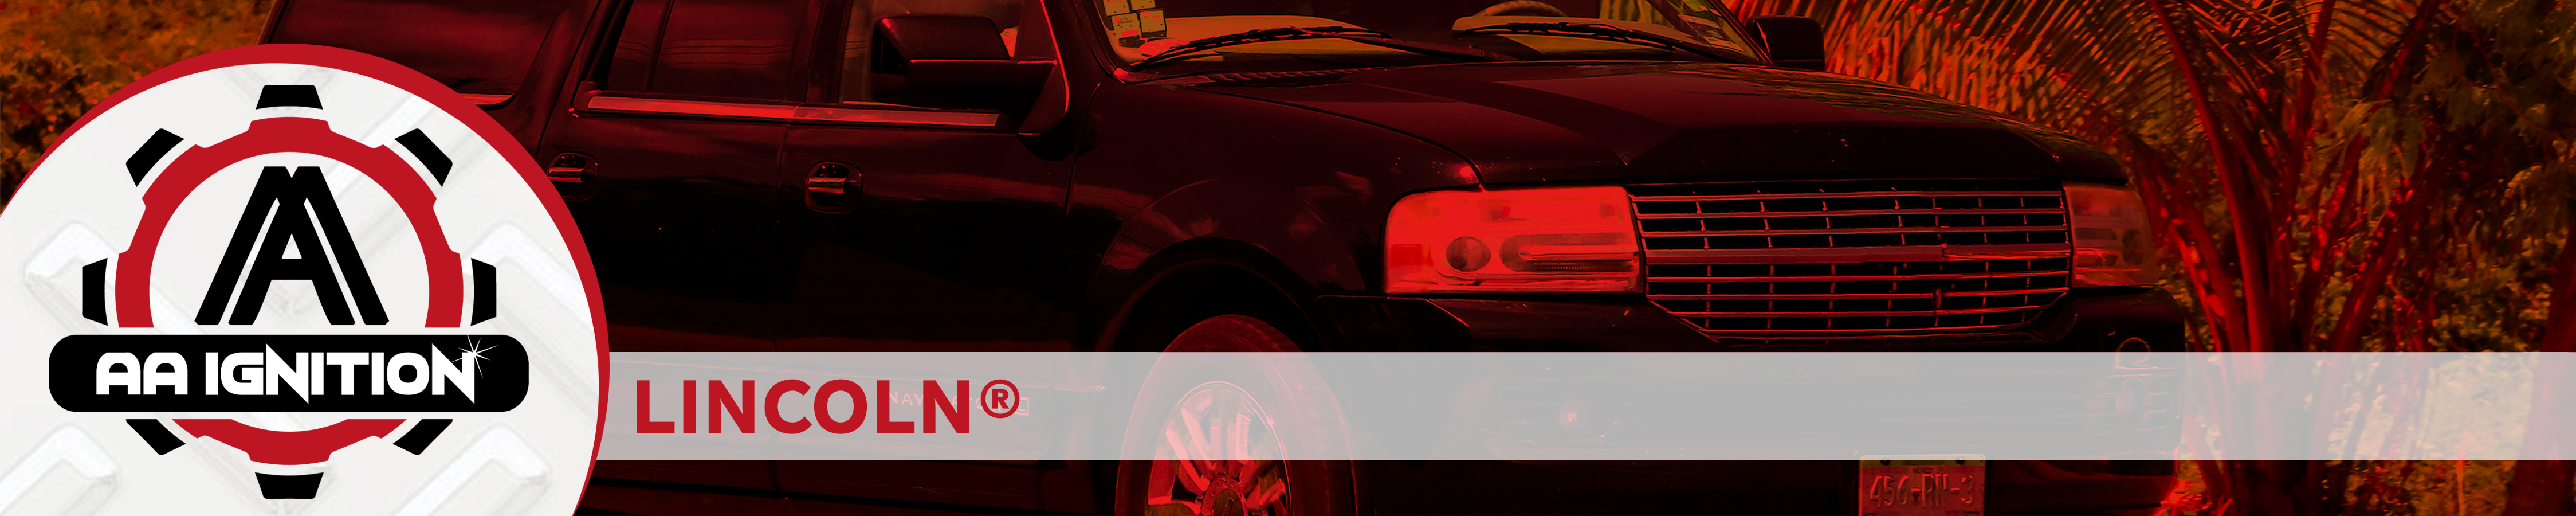 MASO Turn signal Light Right Rear View Mirror turning signal Flashing light for Camry Corolla Prius 81740-52050 81730-52100